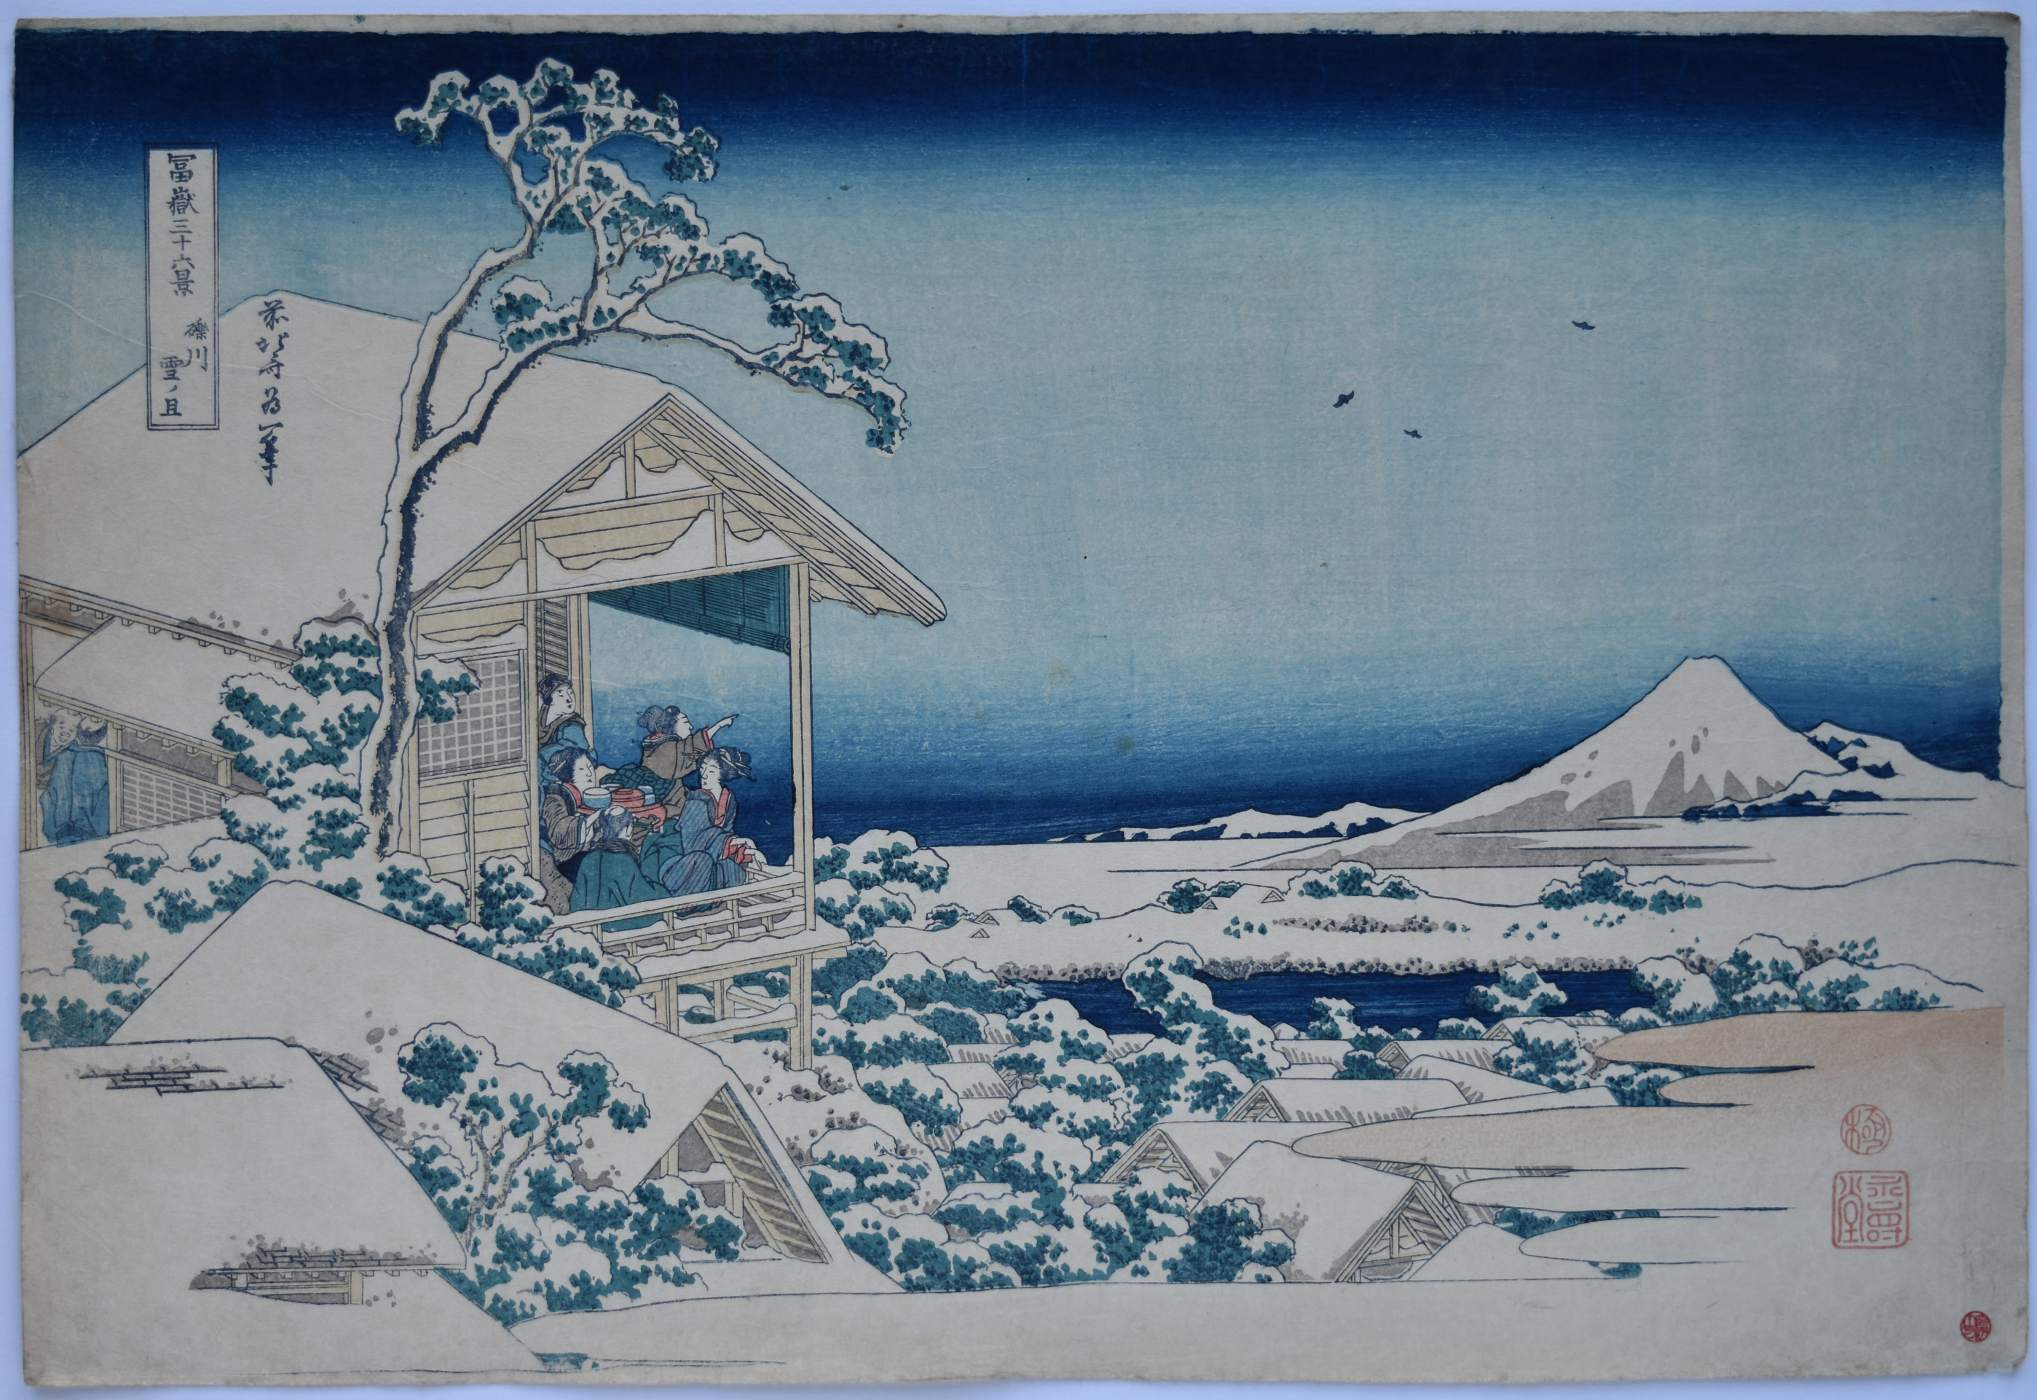 hokusai katsushika Artist hokusai, katsushika (1760-1849) - water wheel at onden - woodblock - for  sale chinese and japanese woodblock prints for sale, serigraphs.